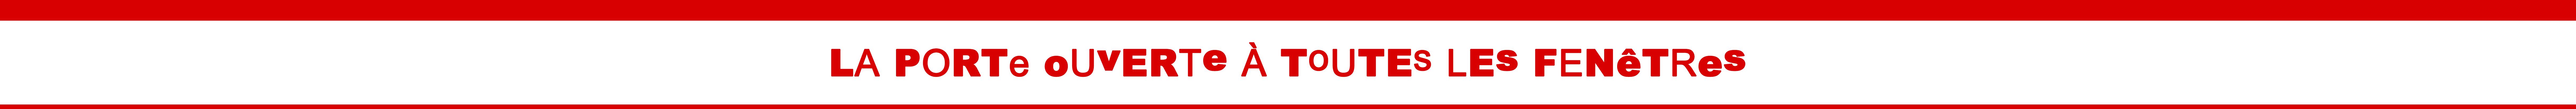 http://labomedia.a.l.f.unblog.fr/files/2020/12/poatlf-07.png